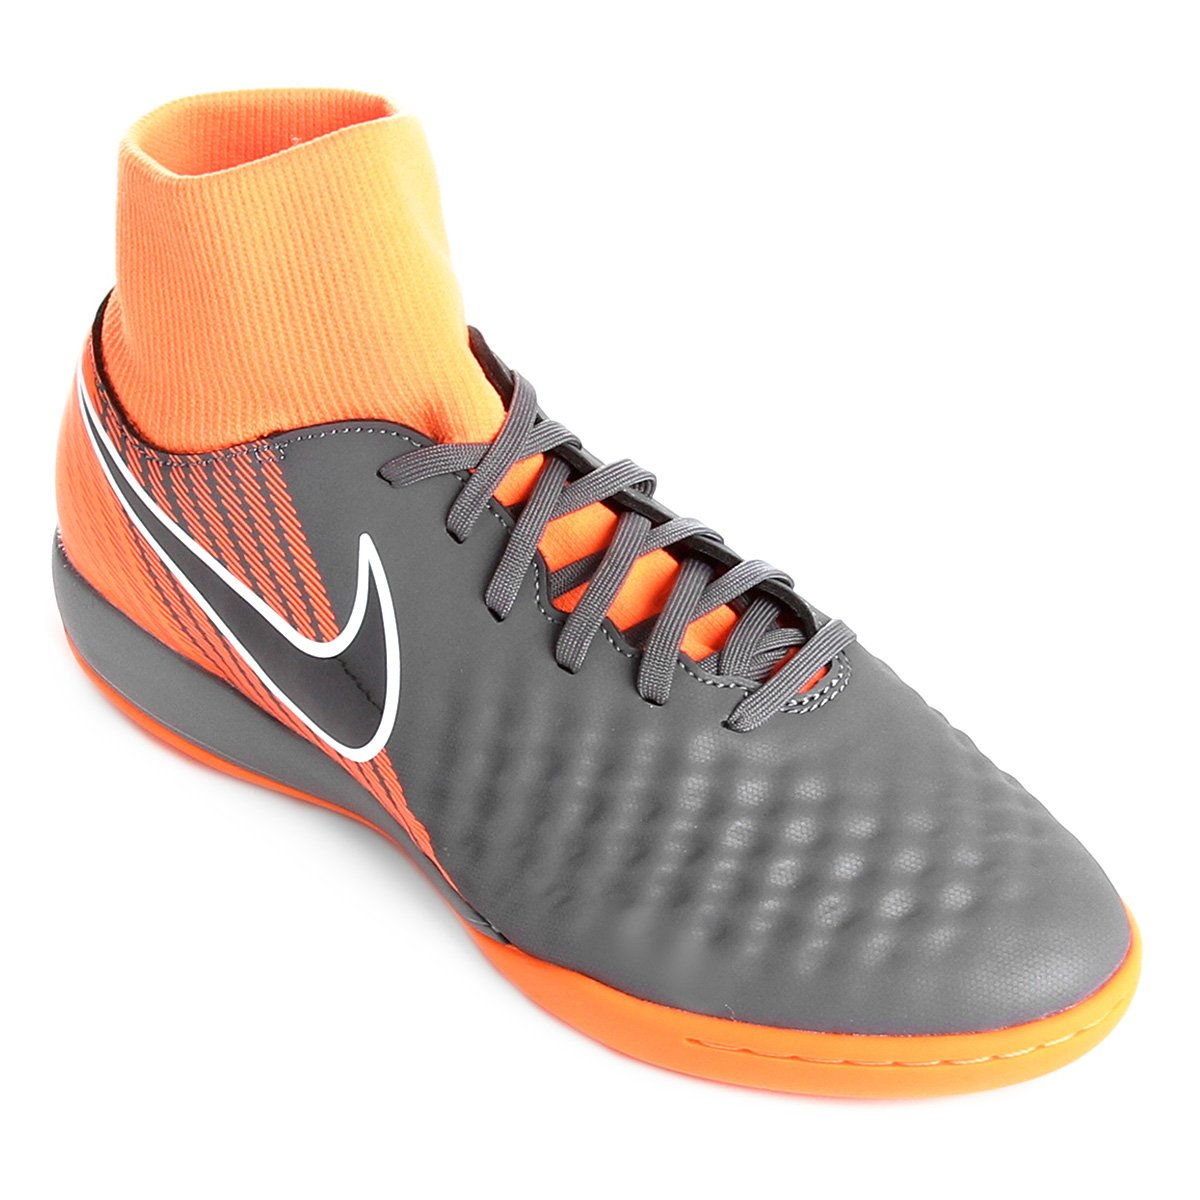 da4e02065b Nike Academy Chuteira Magista Obra e Preto Masculina Futsal Cinza 2 Fit  Dinamic 5x5afXw ...